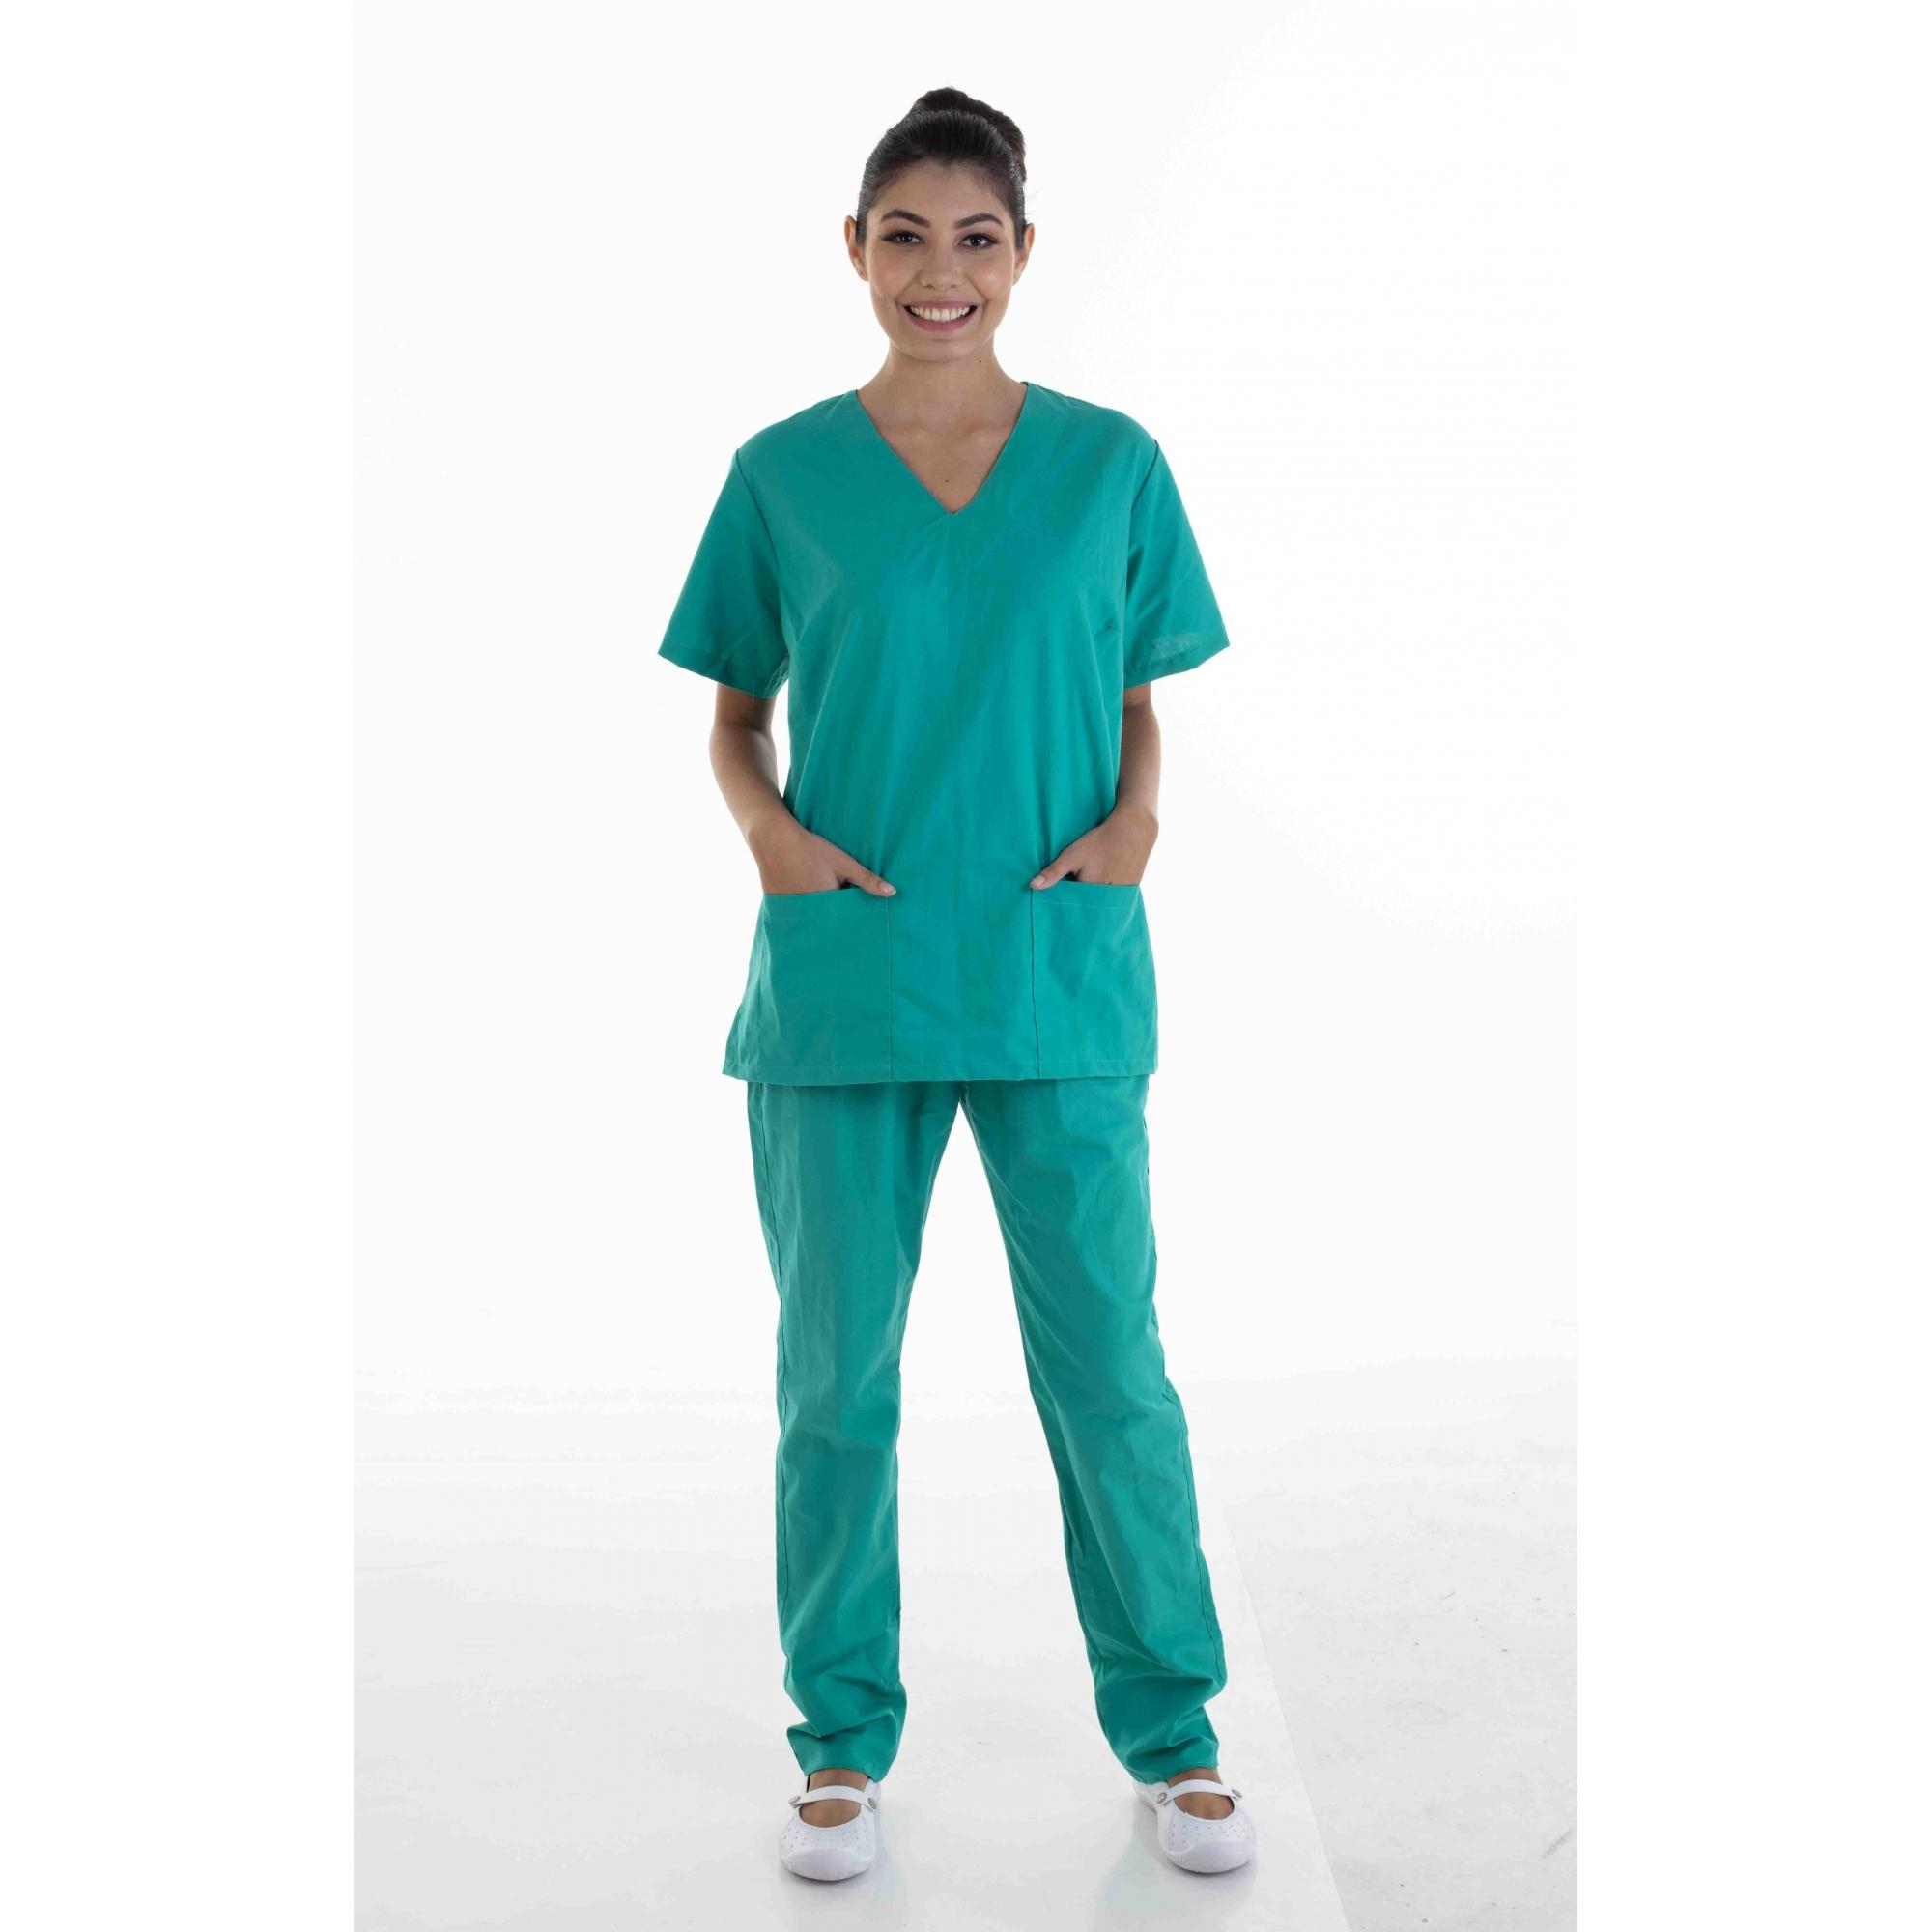 Pijama Cirúrgico   - EBT UNIFORMES